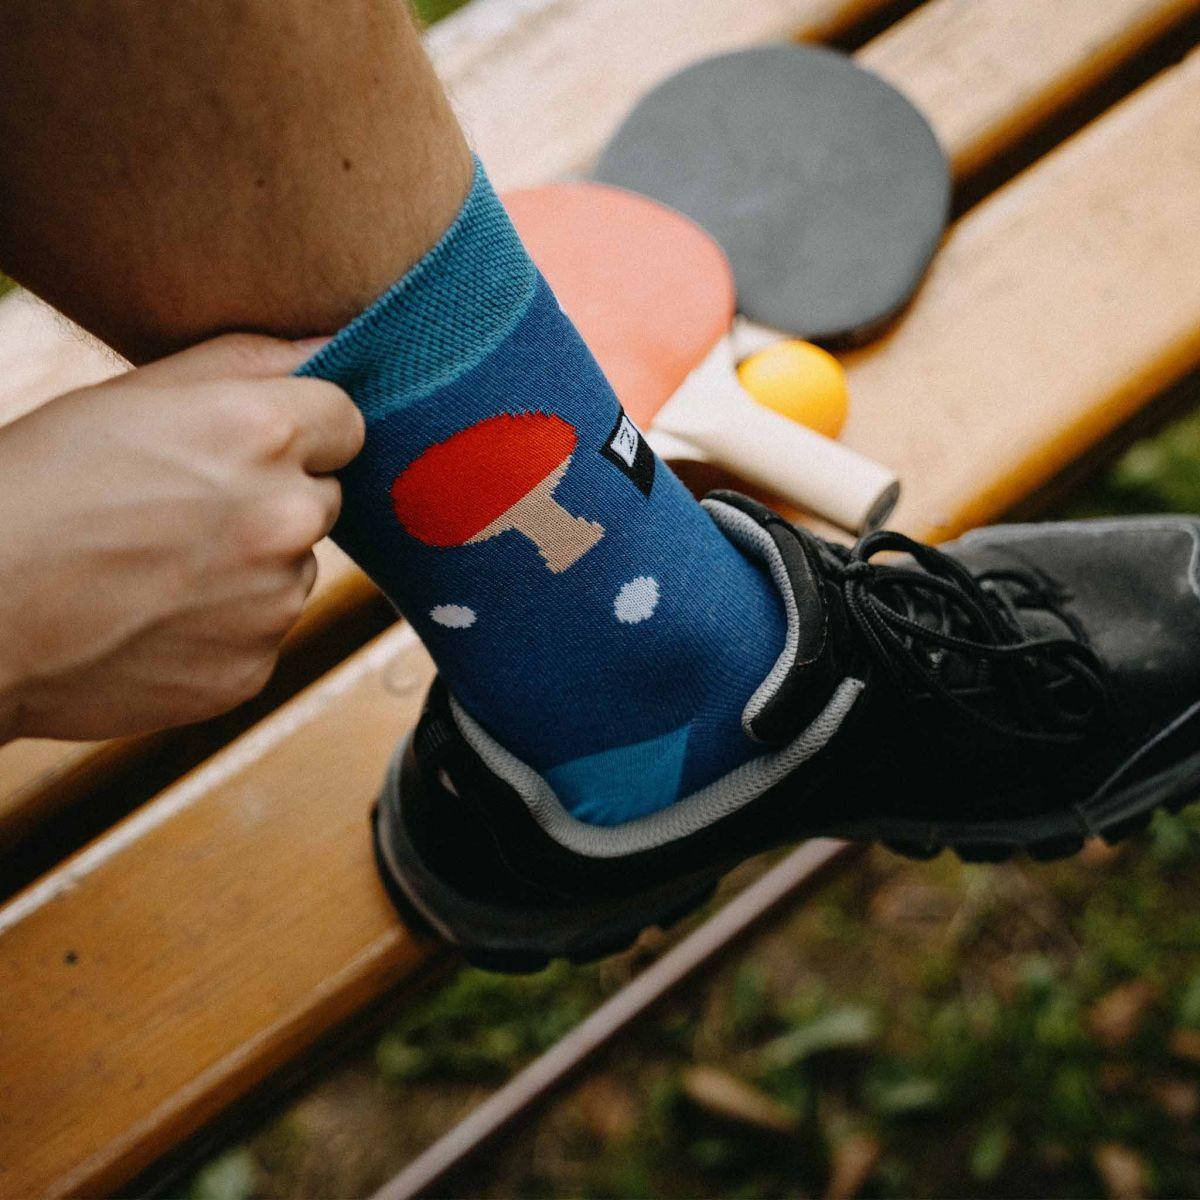 Socken - Tischtennis p2